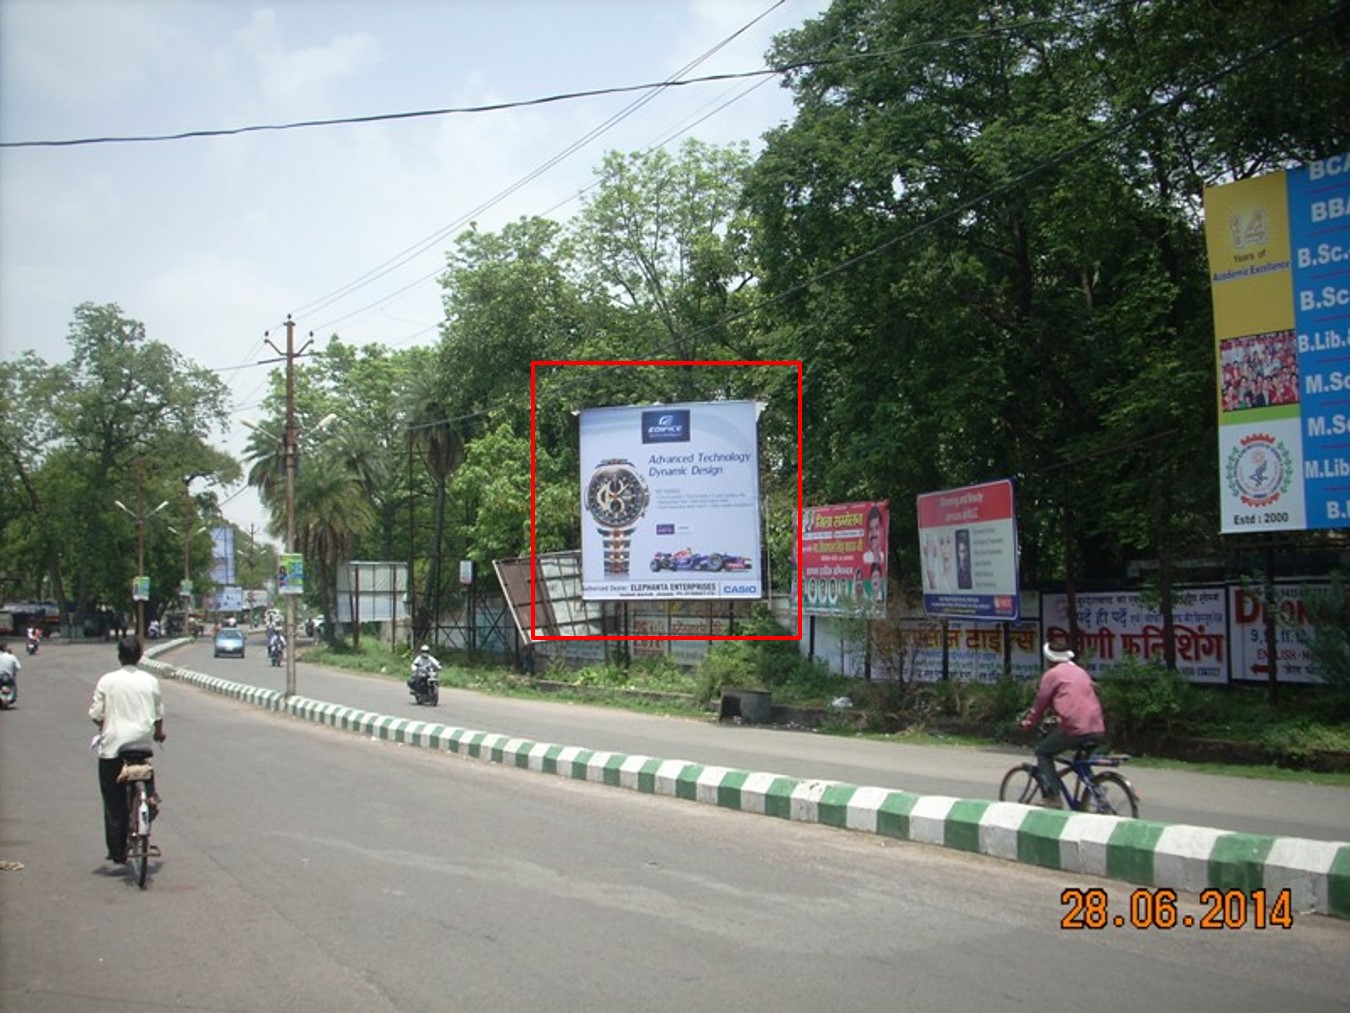 Sadar Bazar, Jhansi